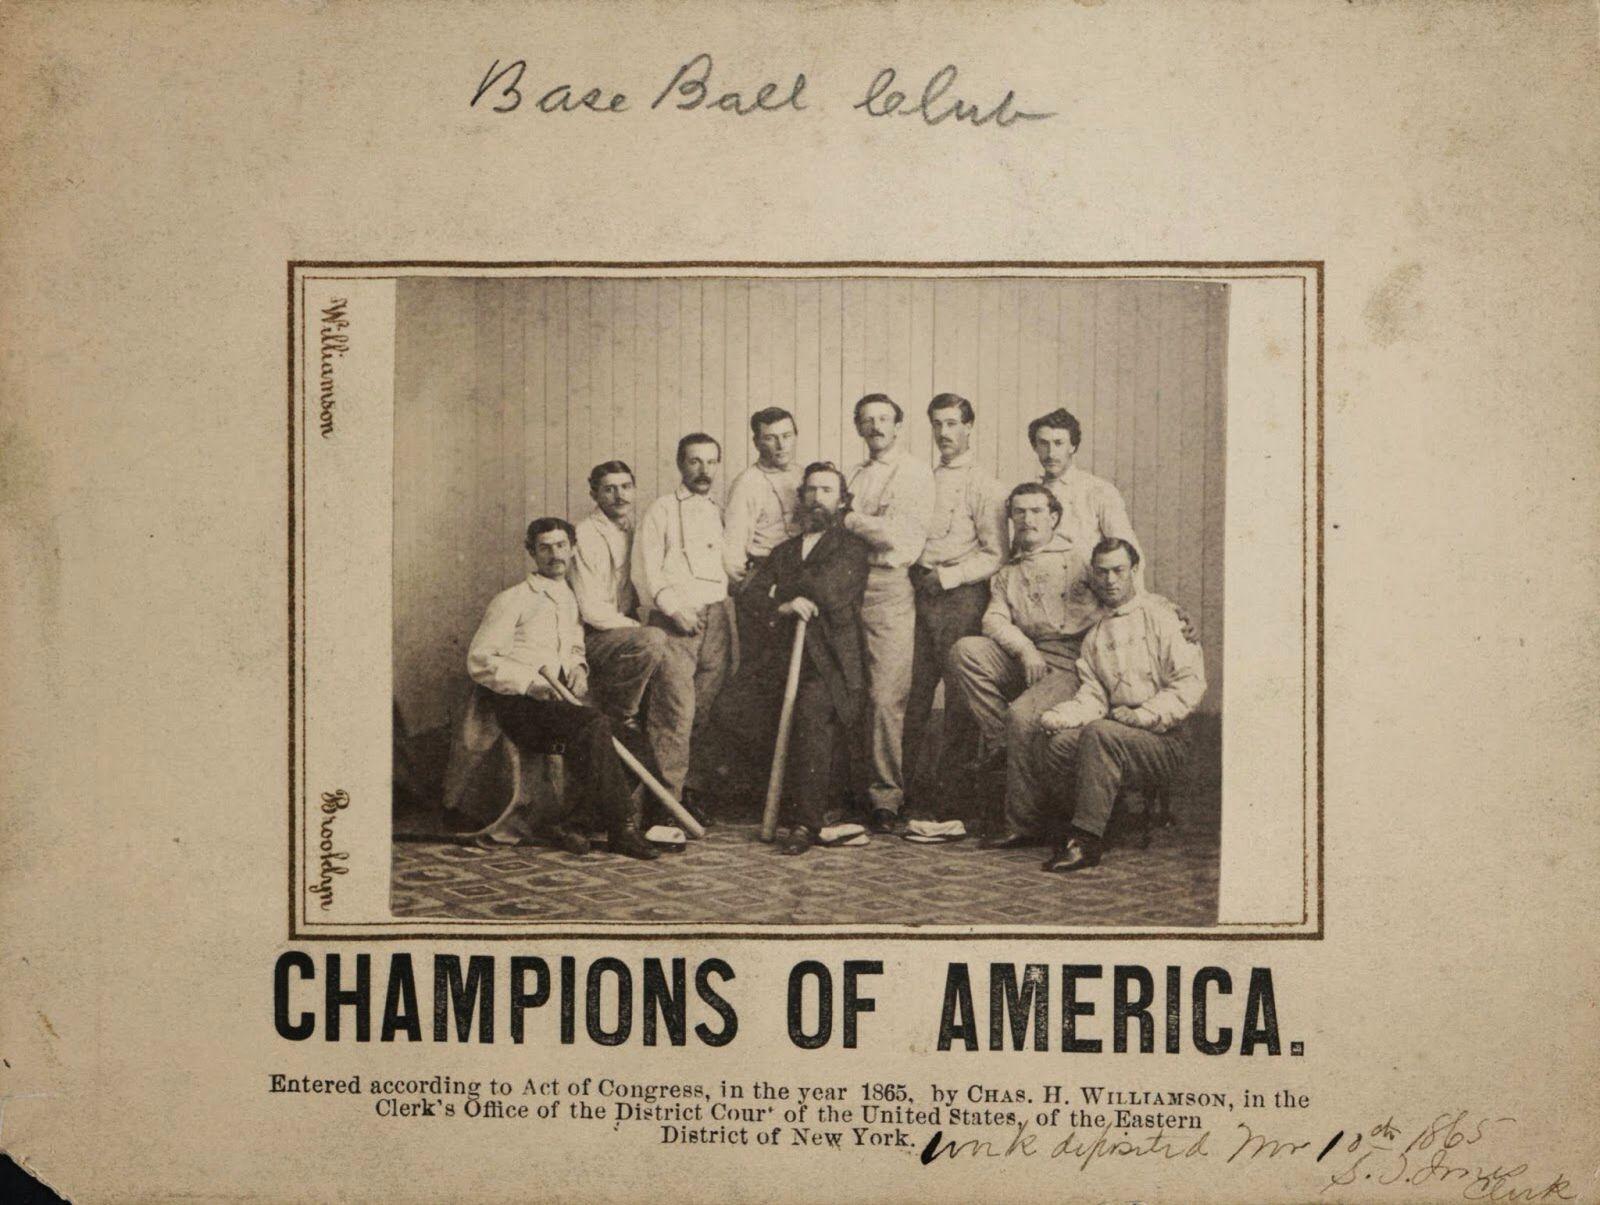 Group portrait of members of the Brooklyn Atlantics